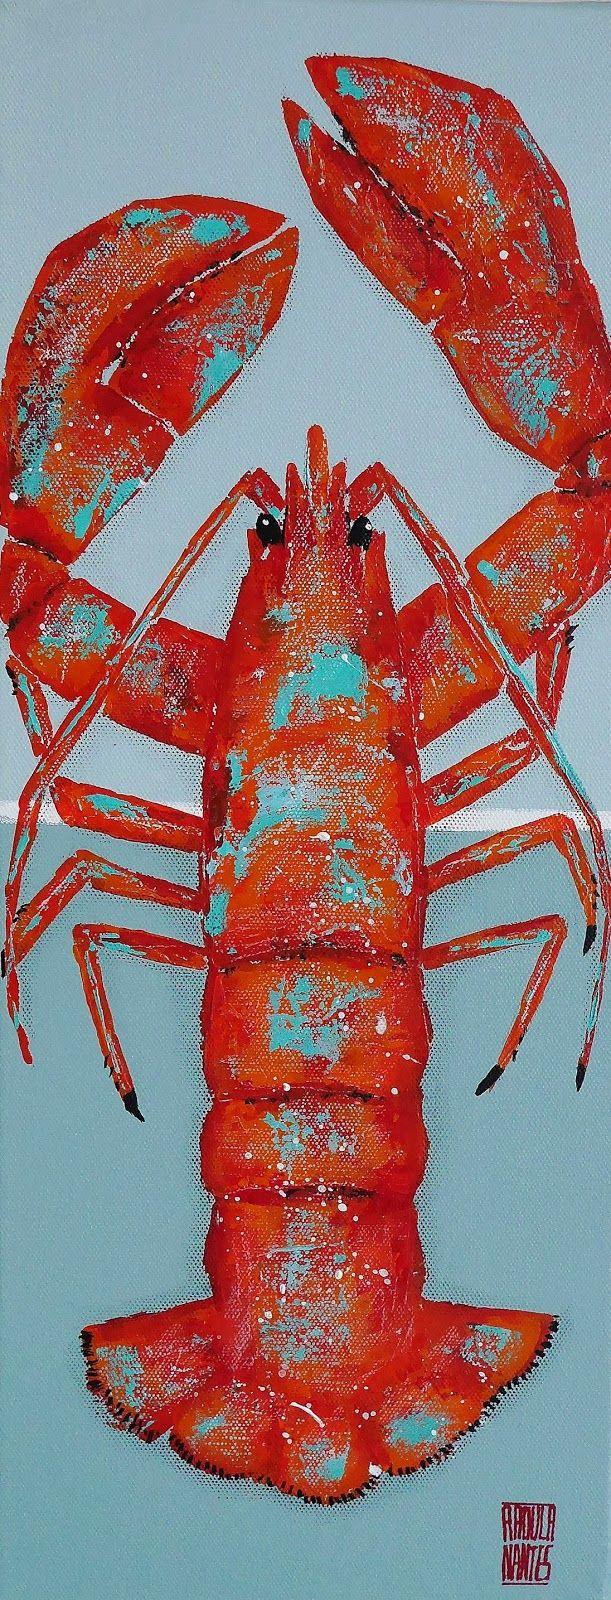 #raoulmadame #lobster #nantes #breizh #brittany